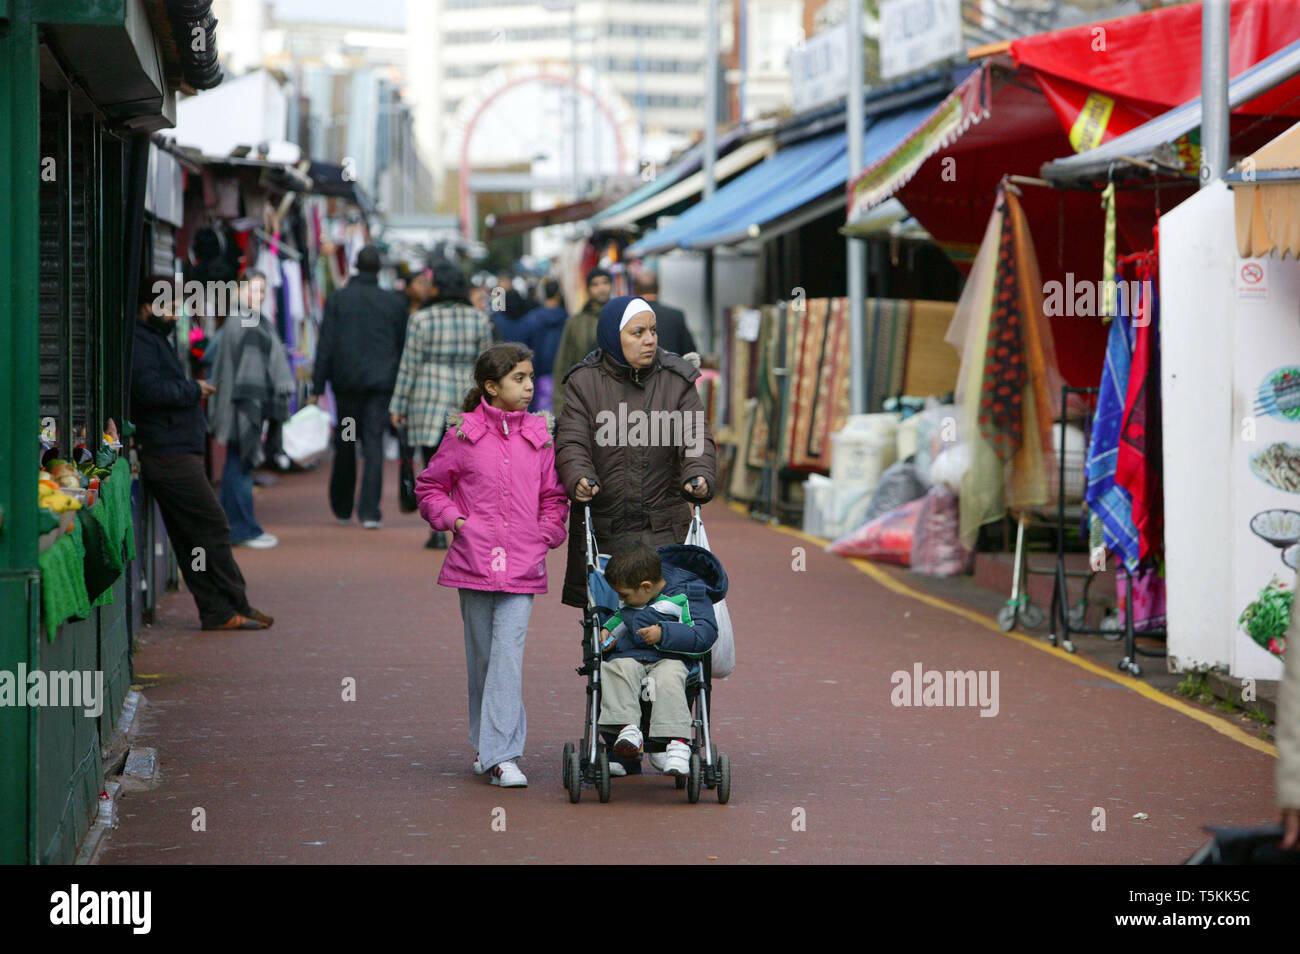 Family walking through Shepherd's Bush Market. Hammersmith, London. 28.10.2010 - Stock Image